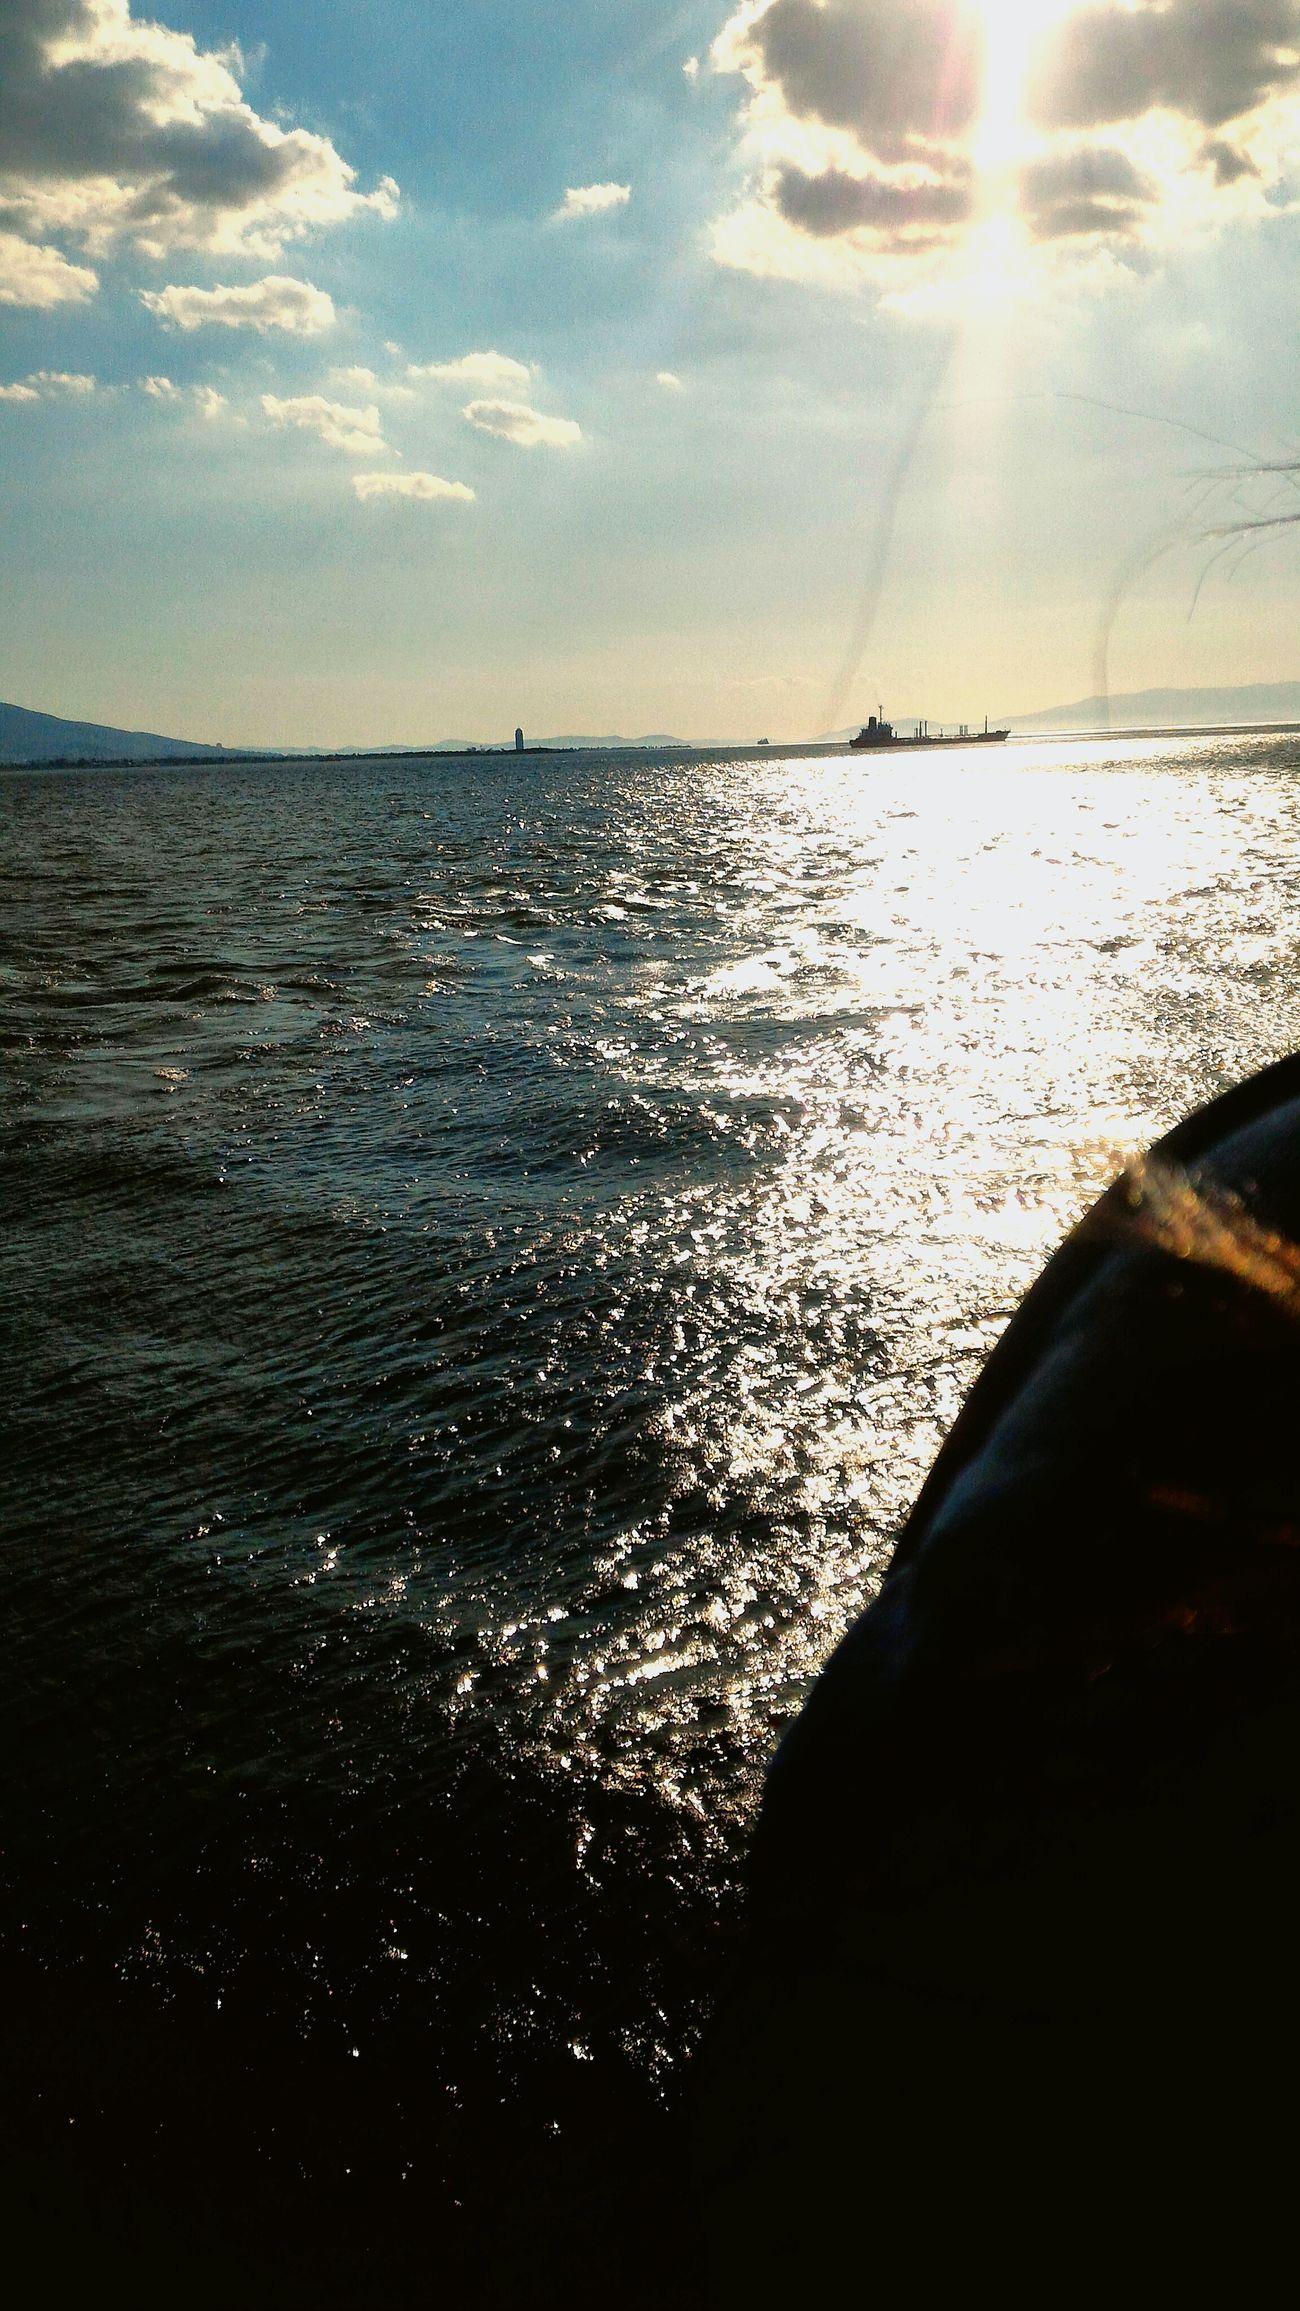 ızmir ❤ Happiness ♡ First Eyeem Photo Sunny Eyeemphotography Sea EyeEm Gallery ı Love My City How's The Weather Today? Hello World ✌